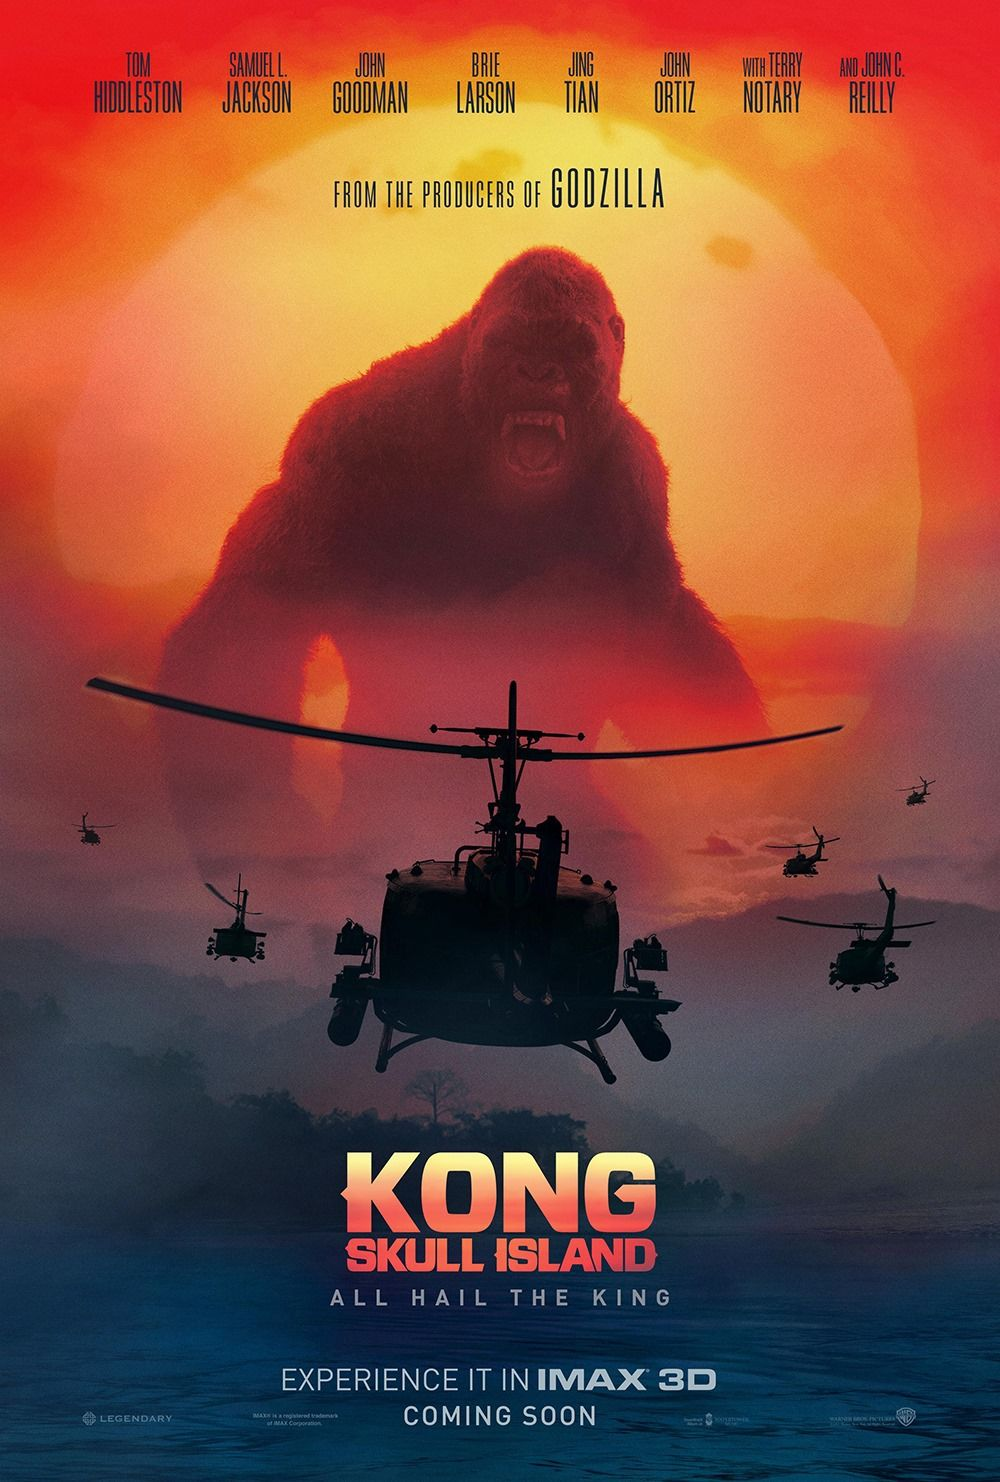 kong skull island full movie online free 123